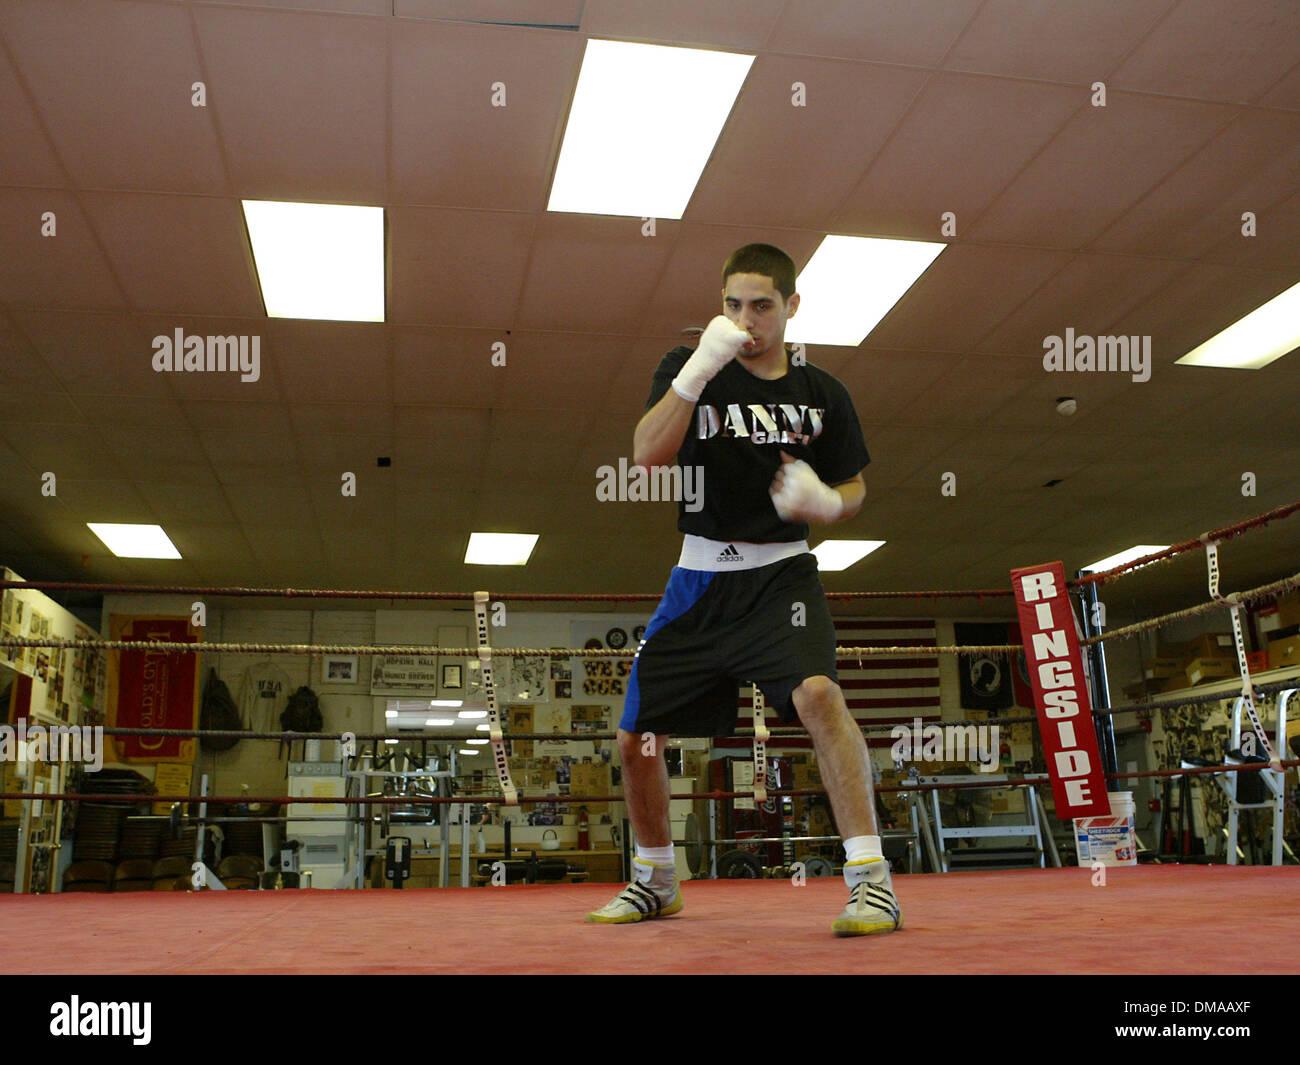 Danny Garcia Stock Photos & Danny Garcia Stock Images - Alamy